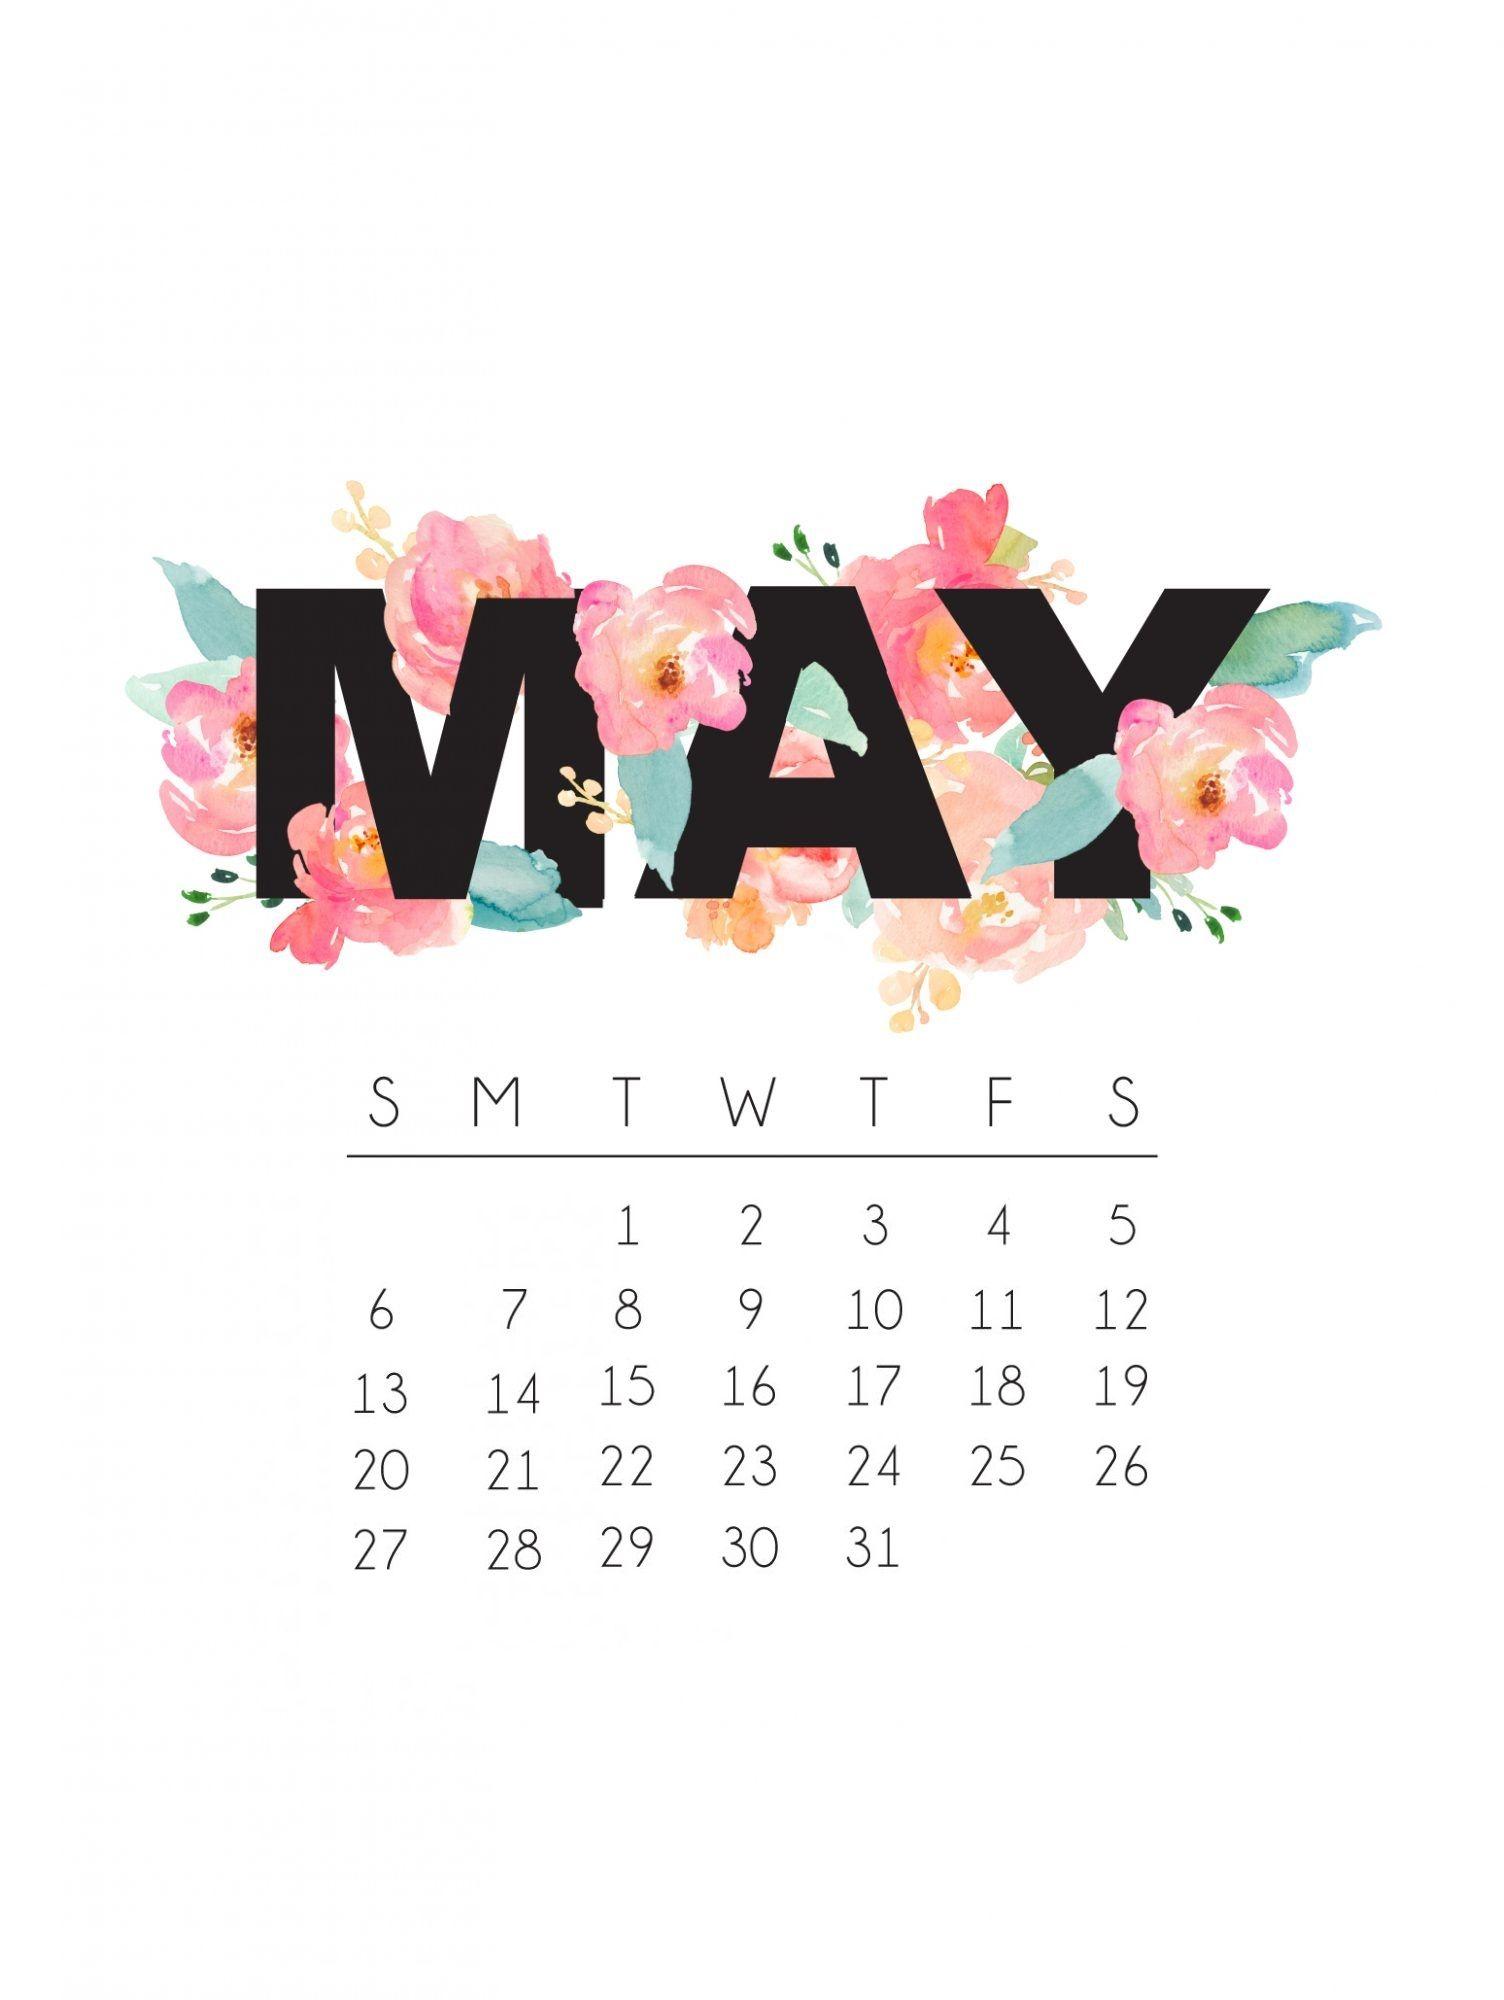 May 2018 IPhone Calendar Wallpaper